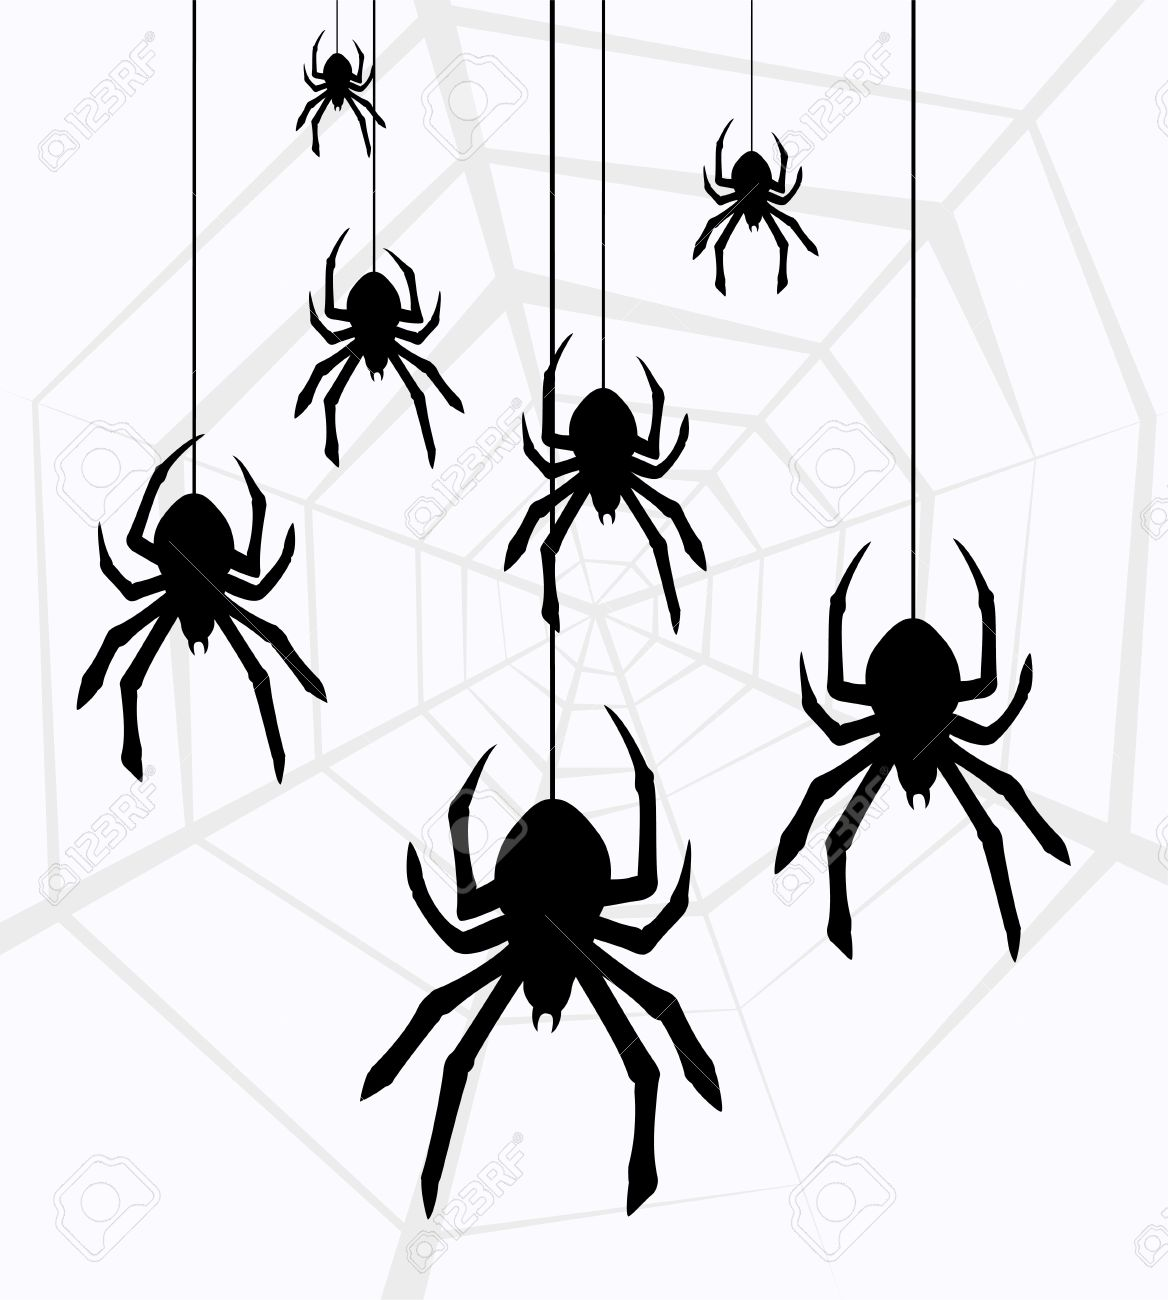 1168x1300 Spiders Clip Art